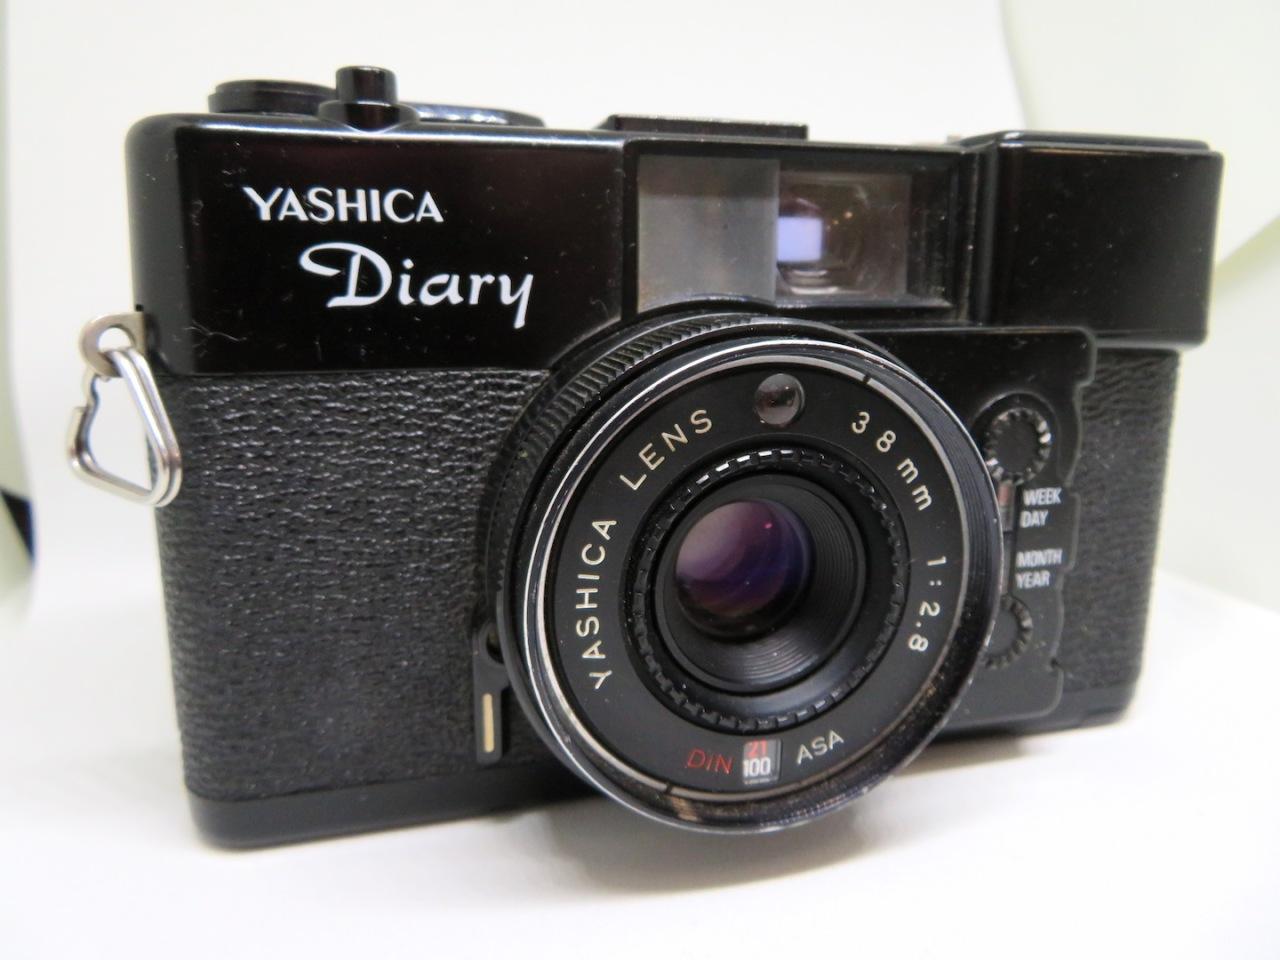 Yashica Diary